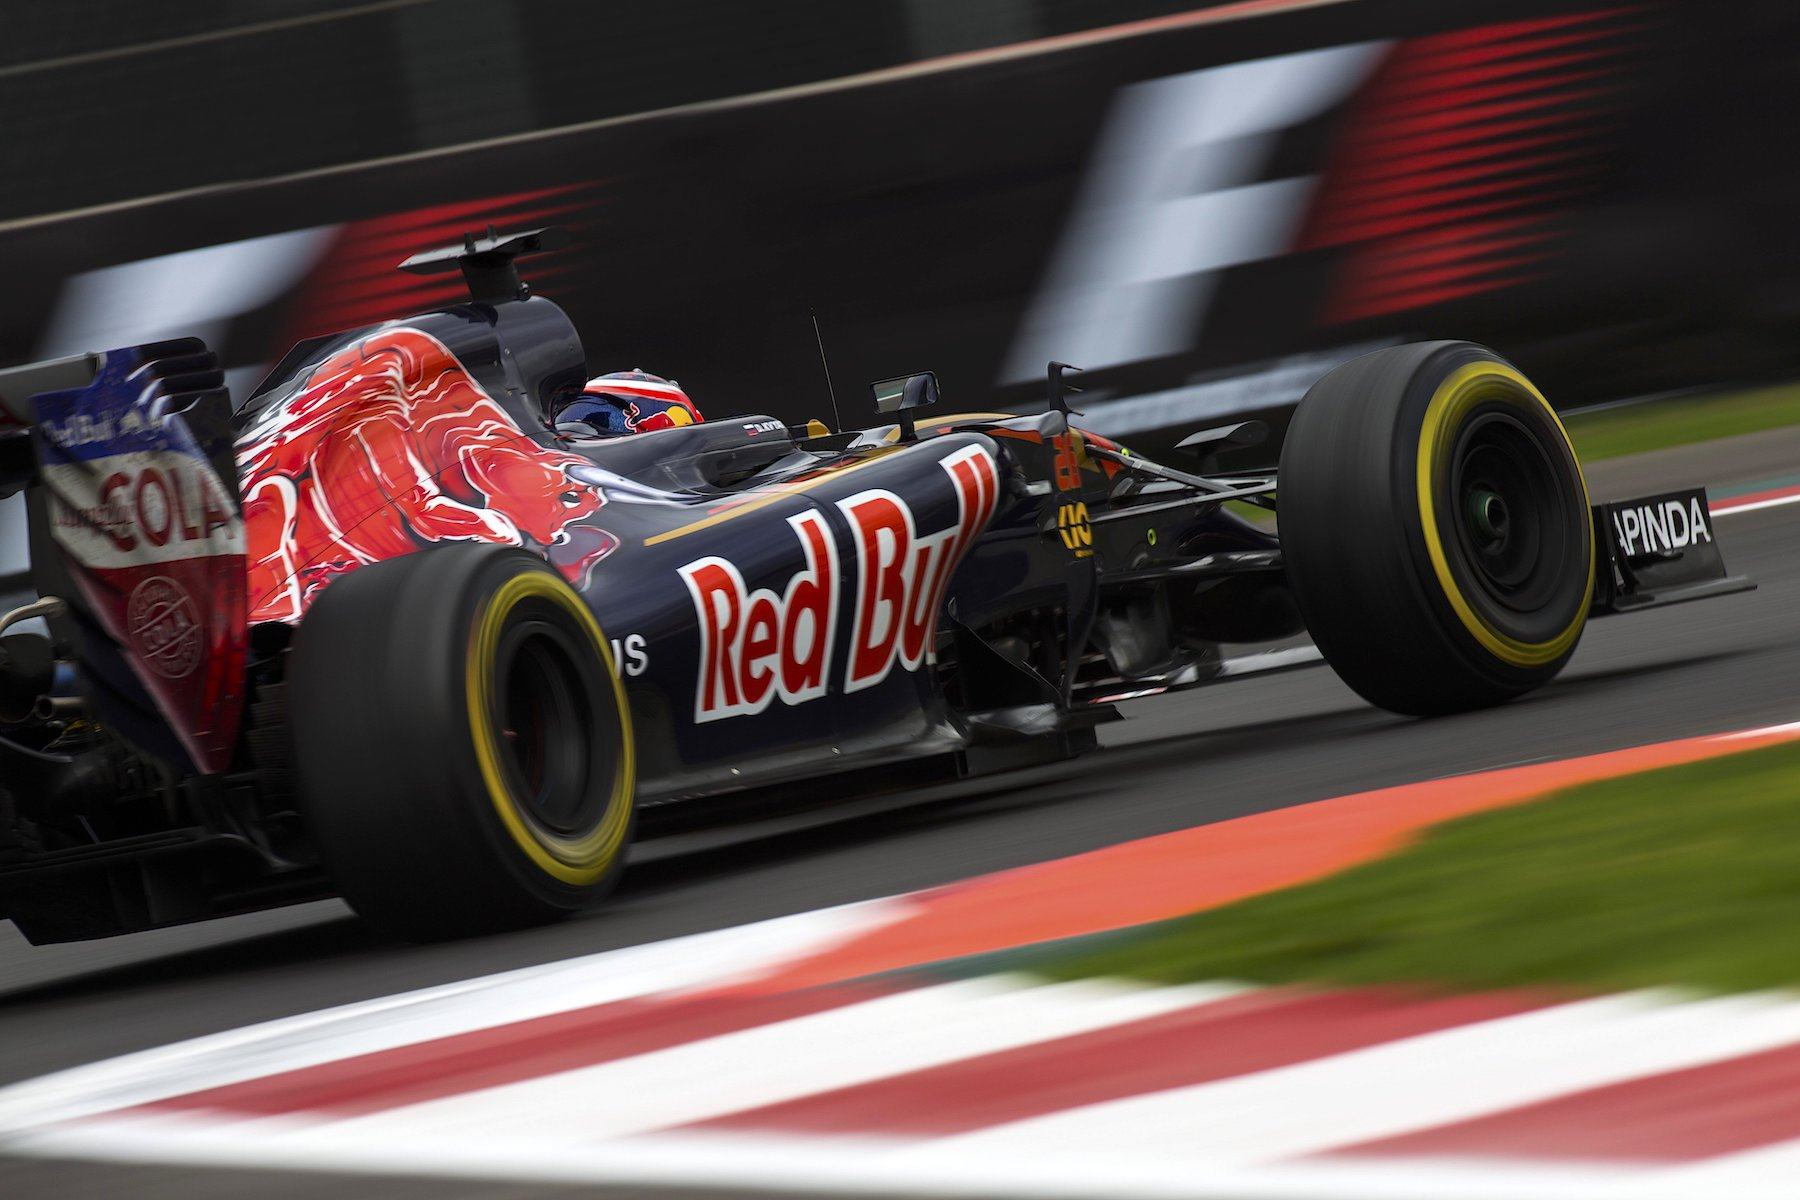 Salracing - Daniil Kvyat   Scuderia Toro Rosso